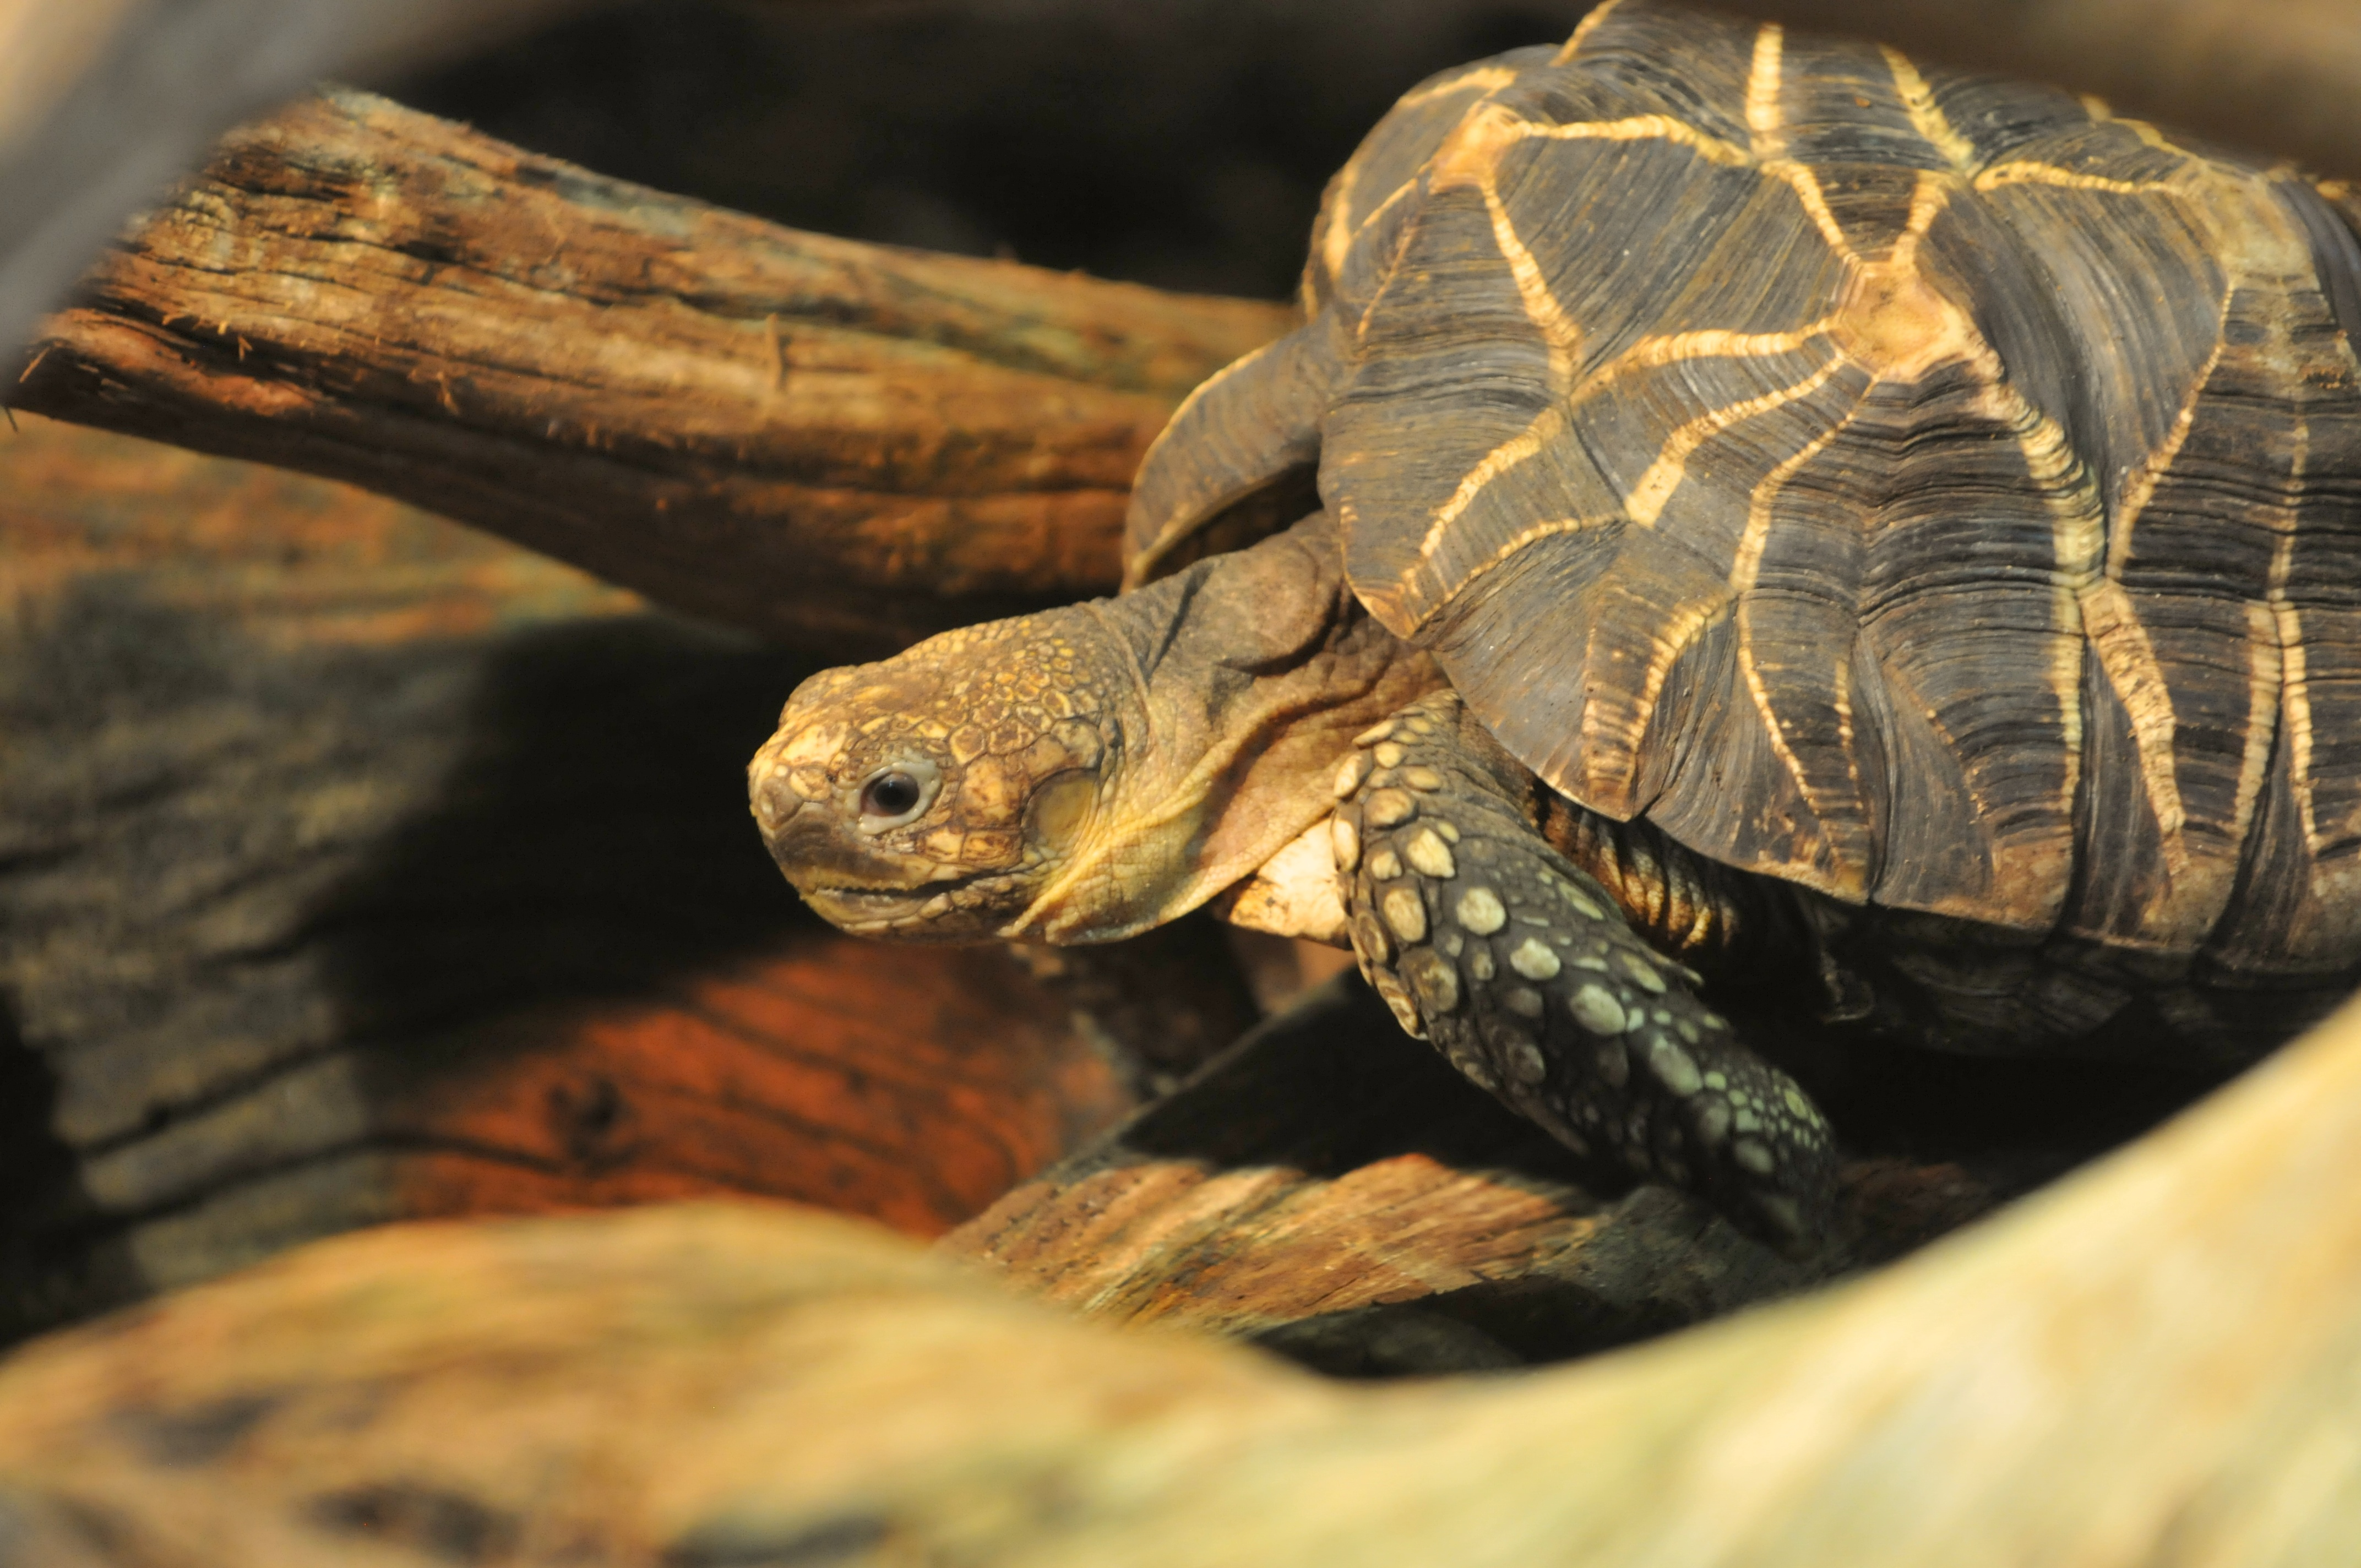 Sternschildkröte, Geochelone platynota